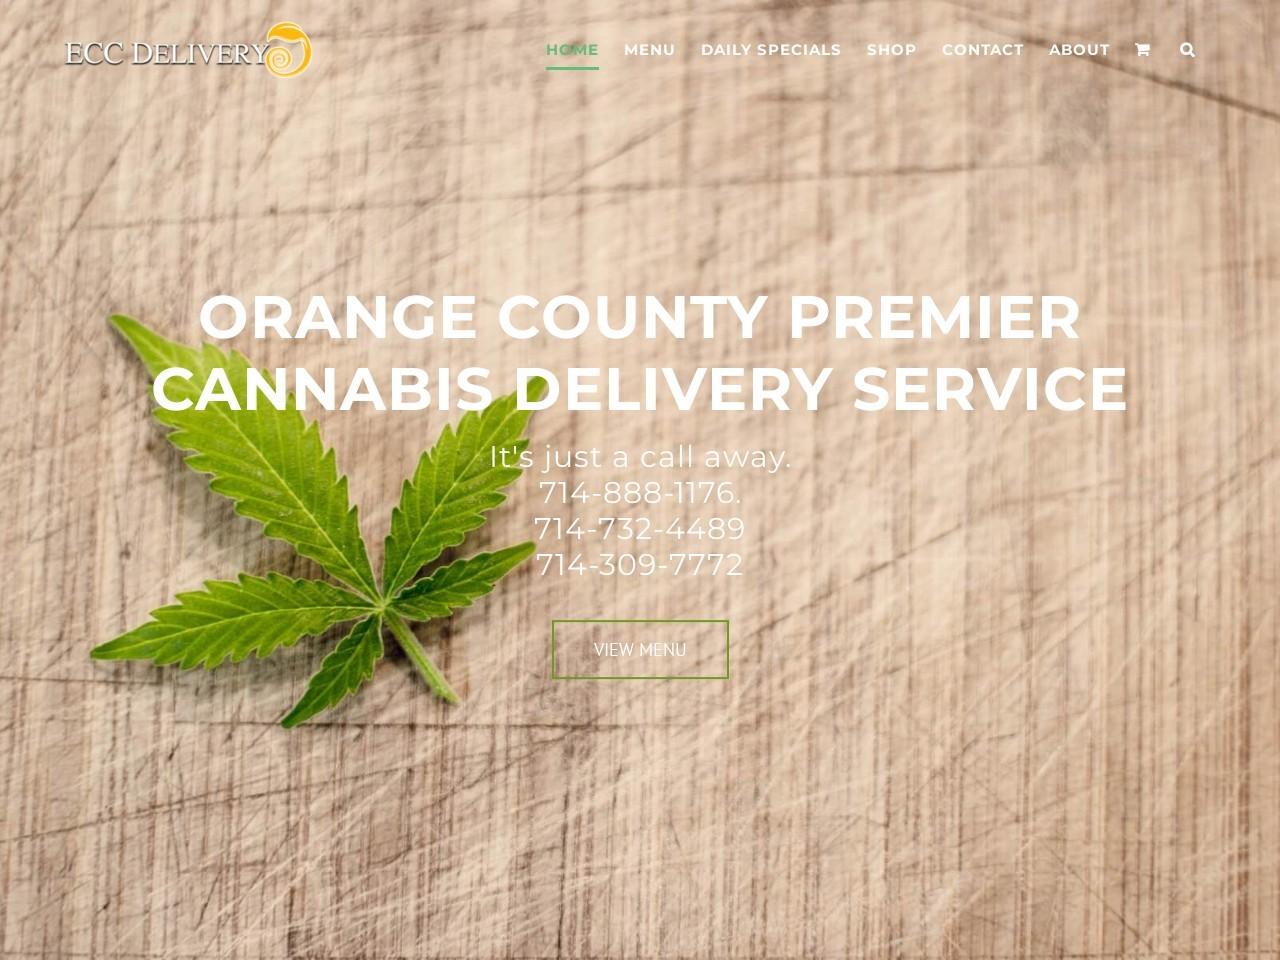 Best vapes in orange county California | ECC-DELIVERY